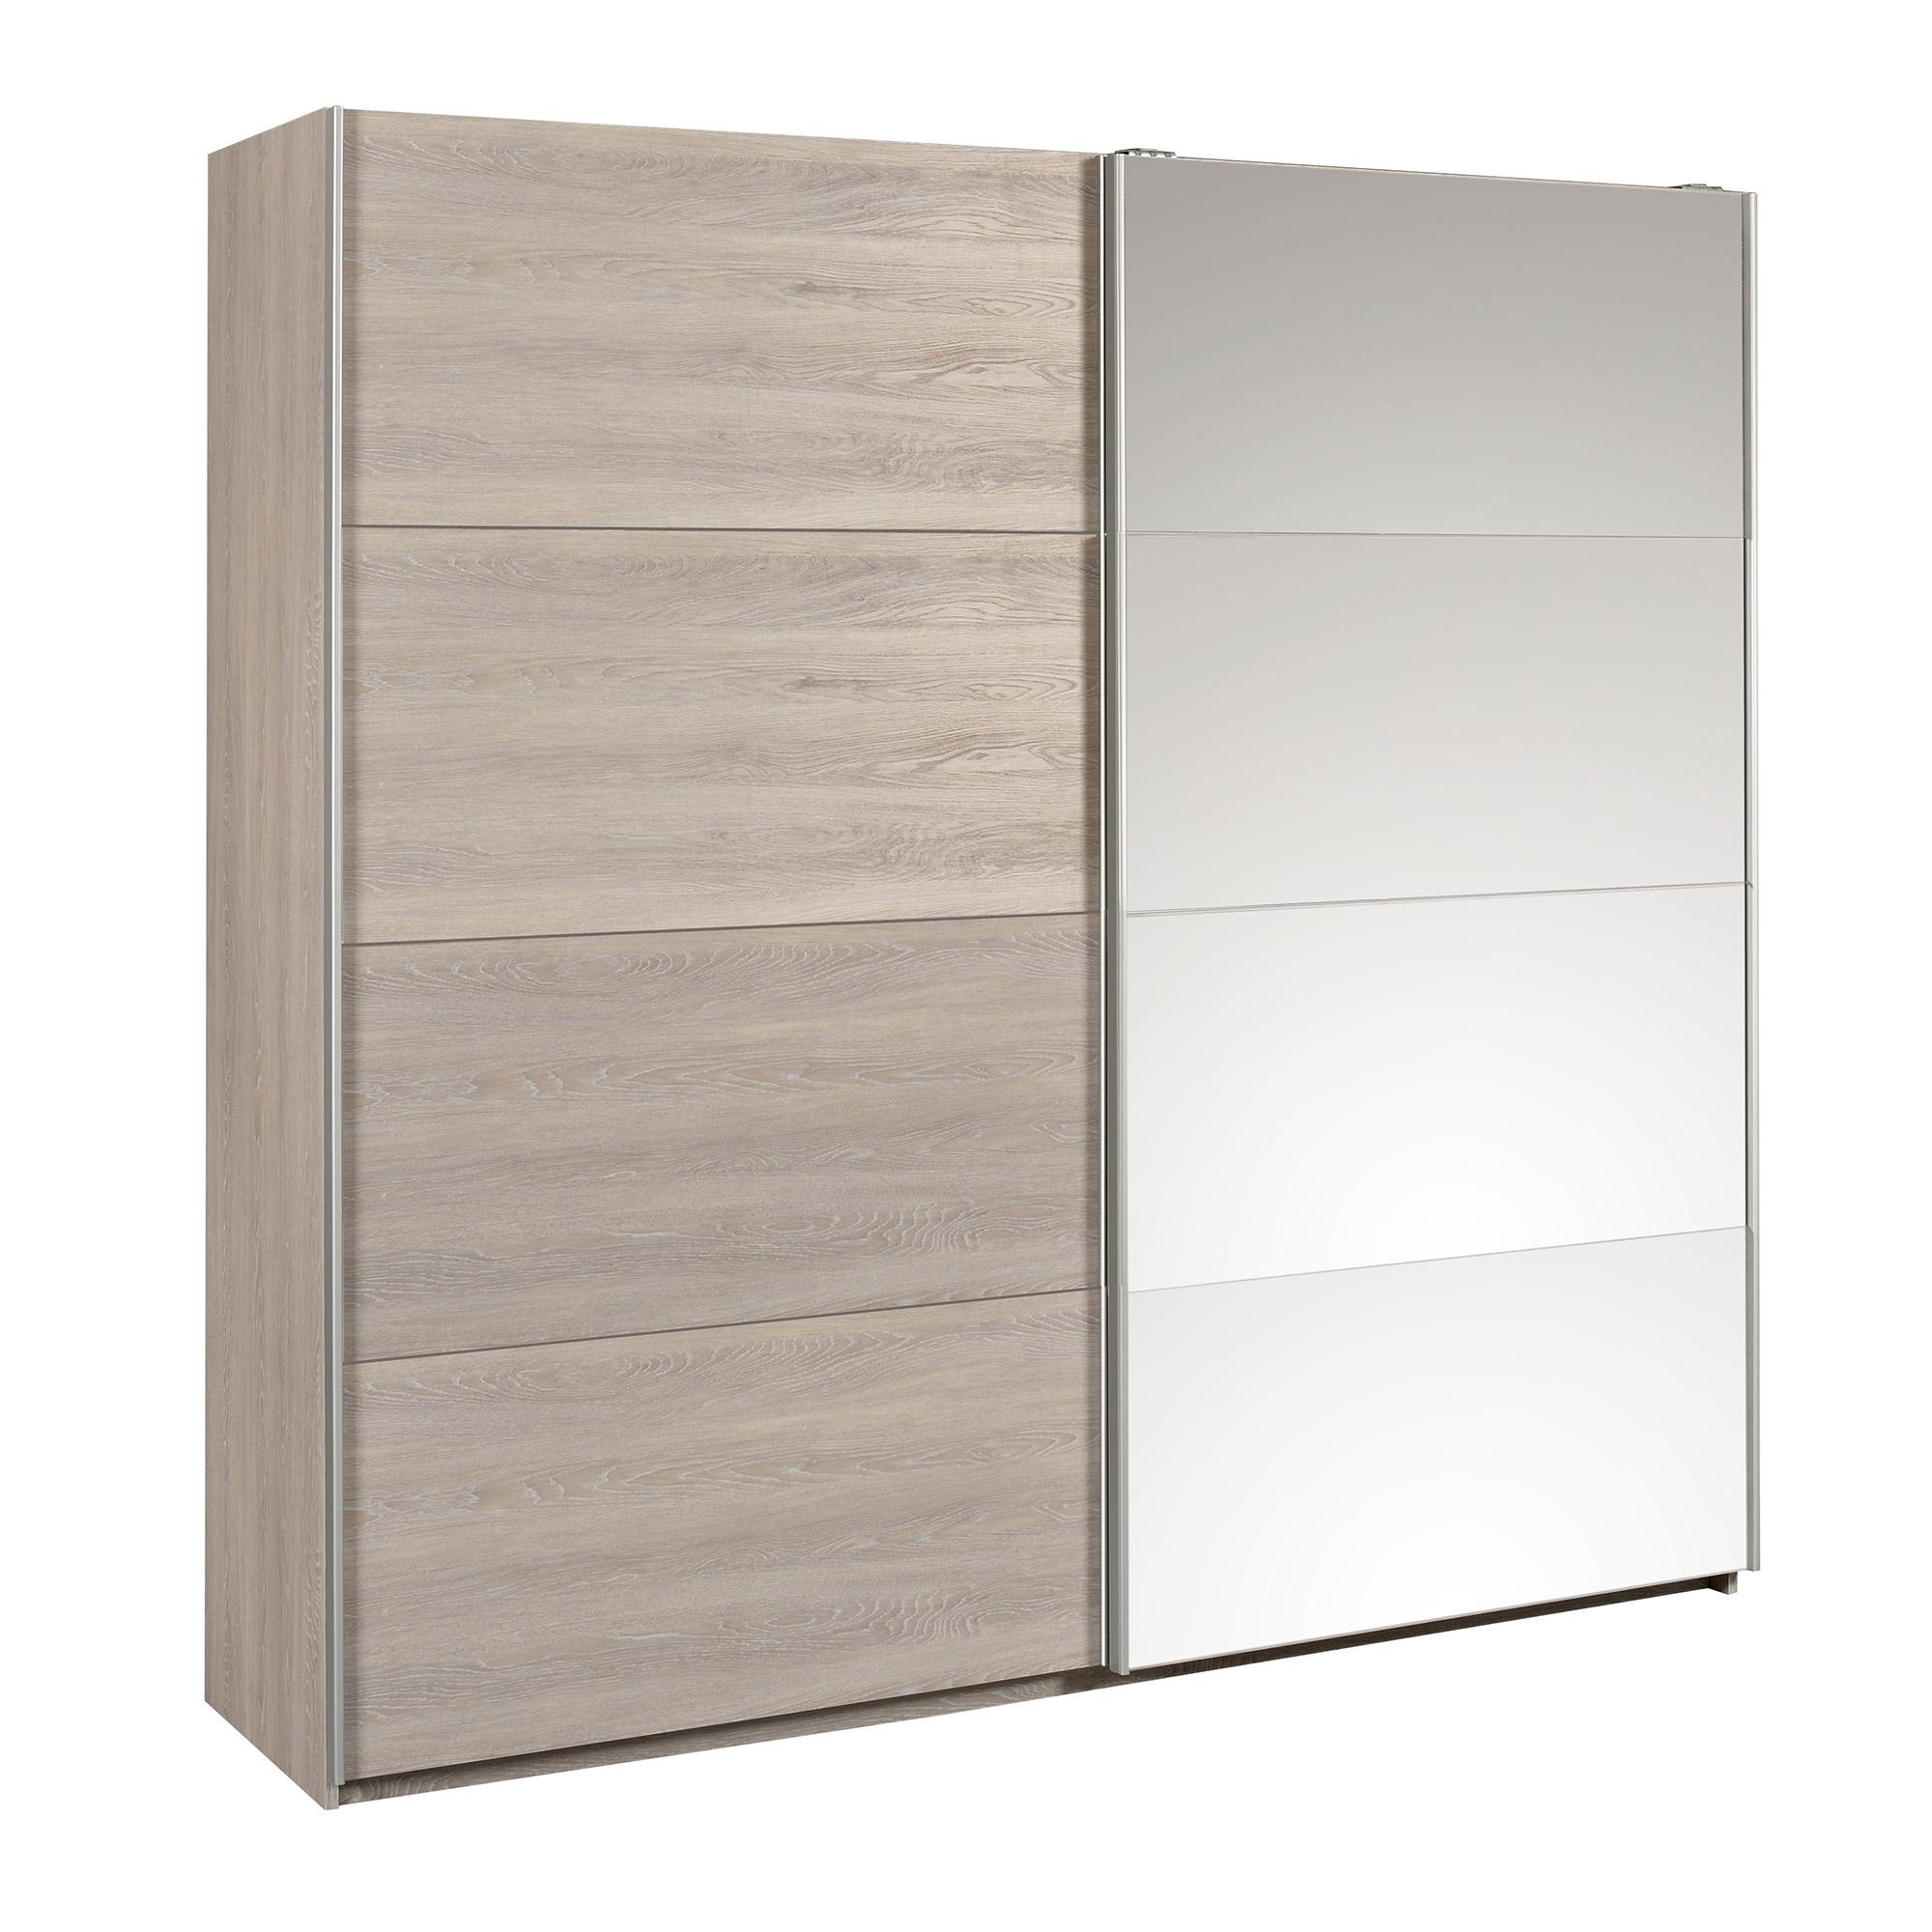 armoire 2 portes gris oak lima. Black Bedroom Furniture Sets. Home Design Ideas